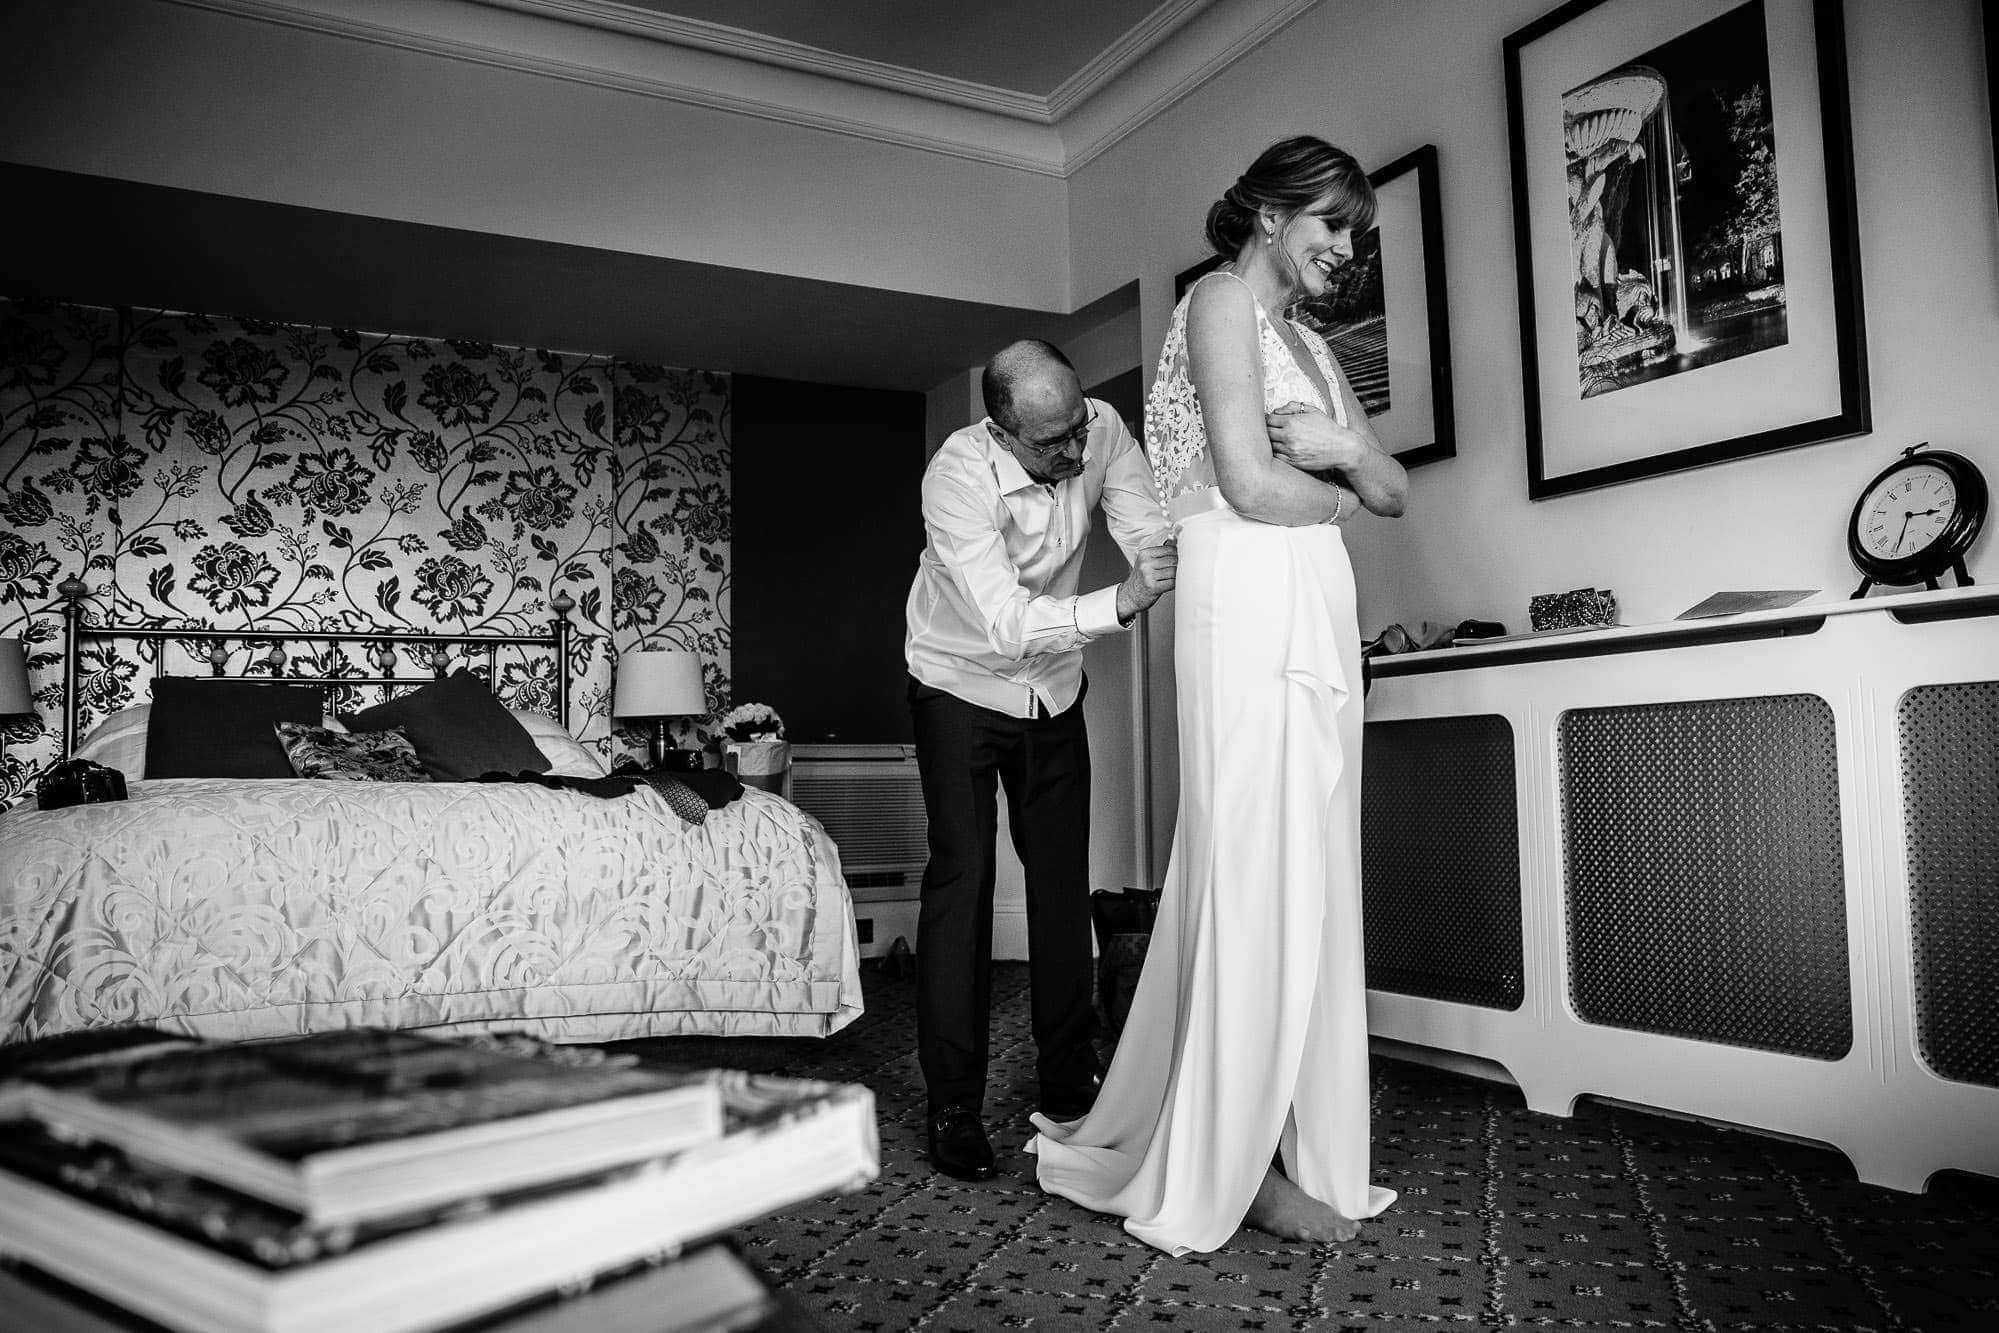 Groom doing up wedding dress